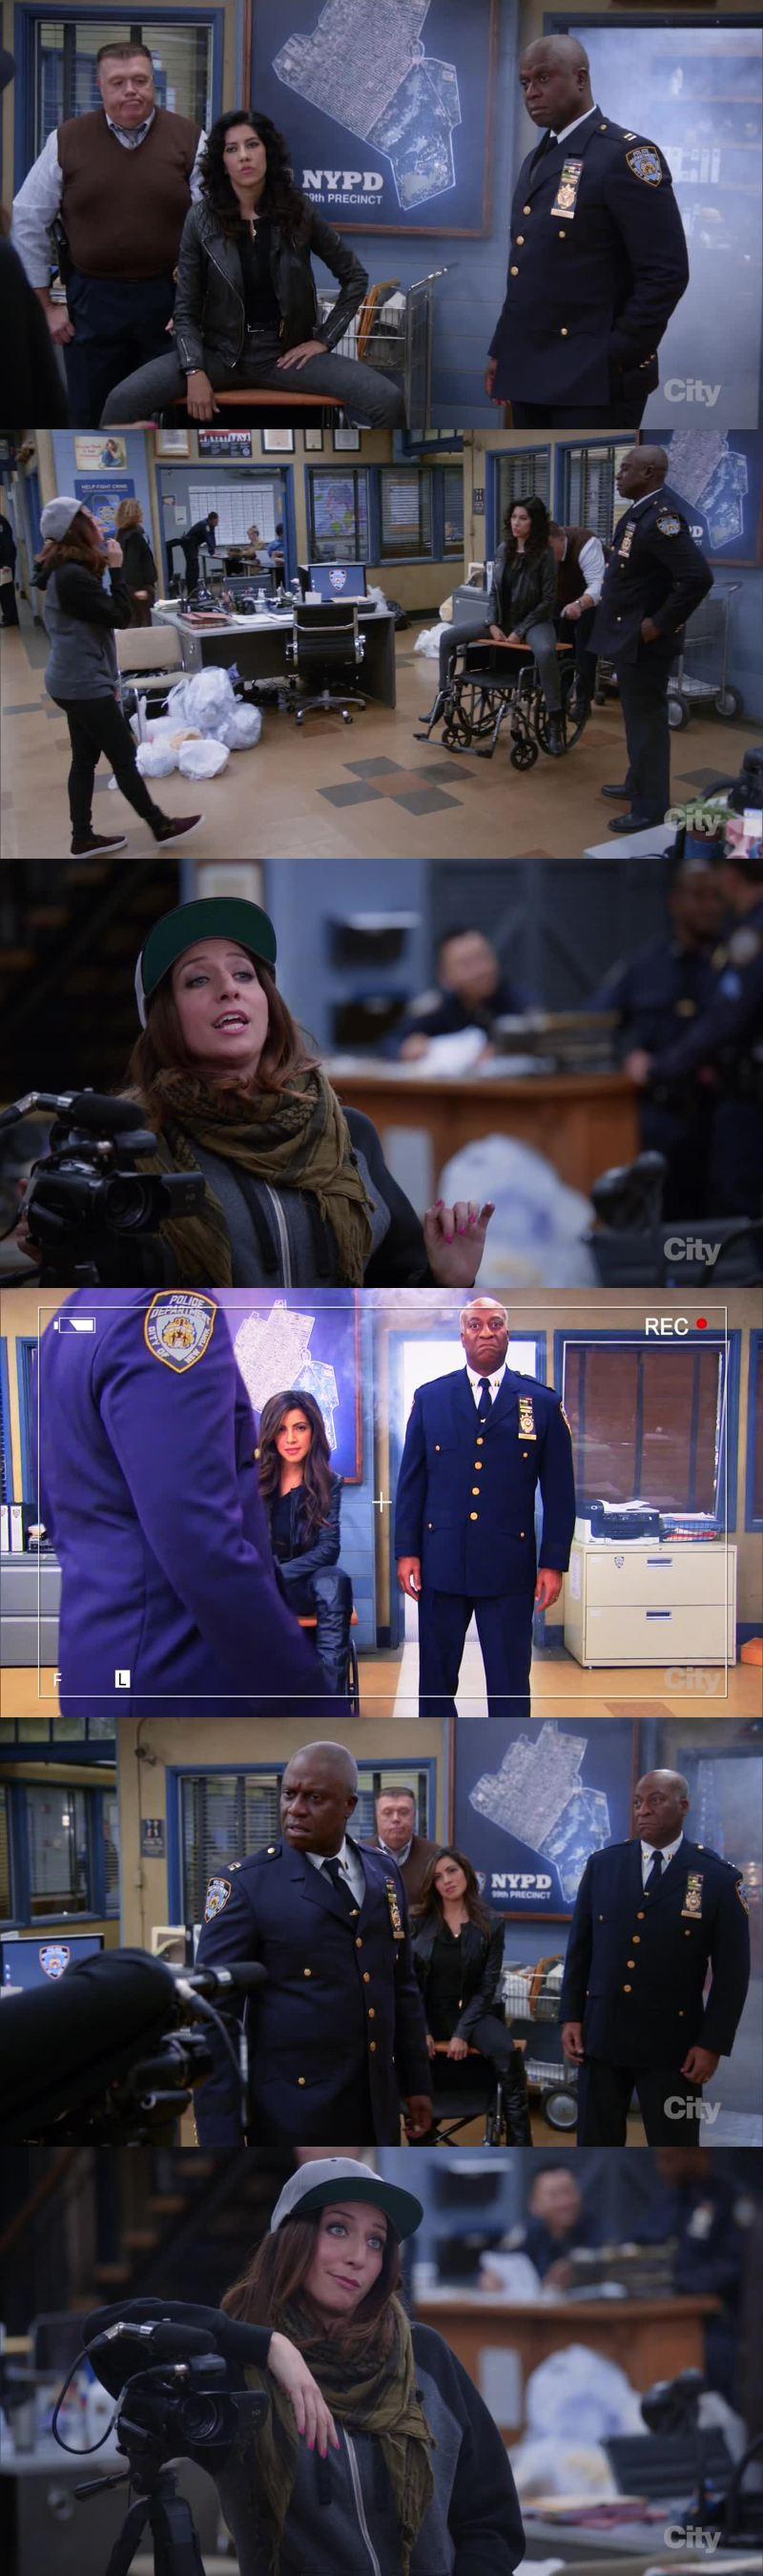 Oh Gina Gina Gina 😂😅